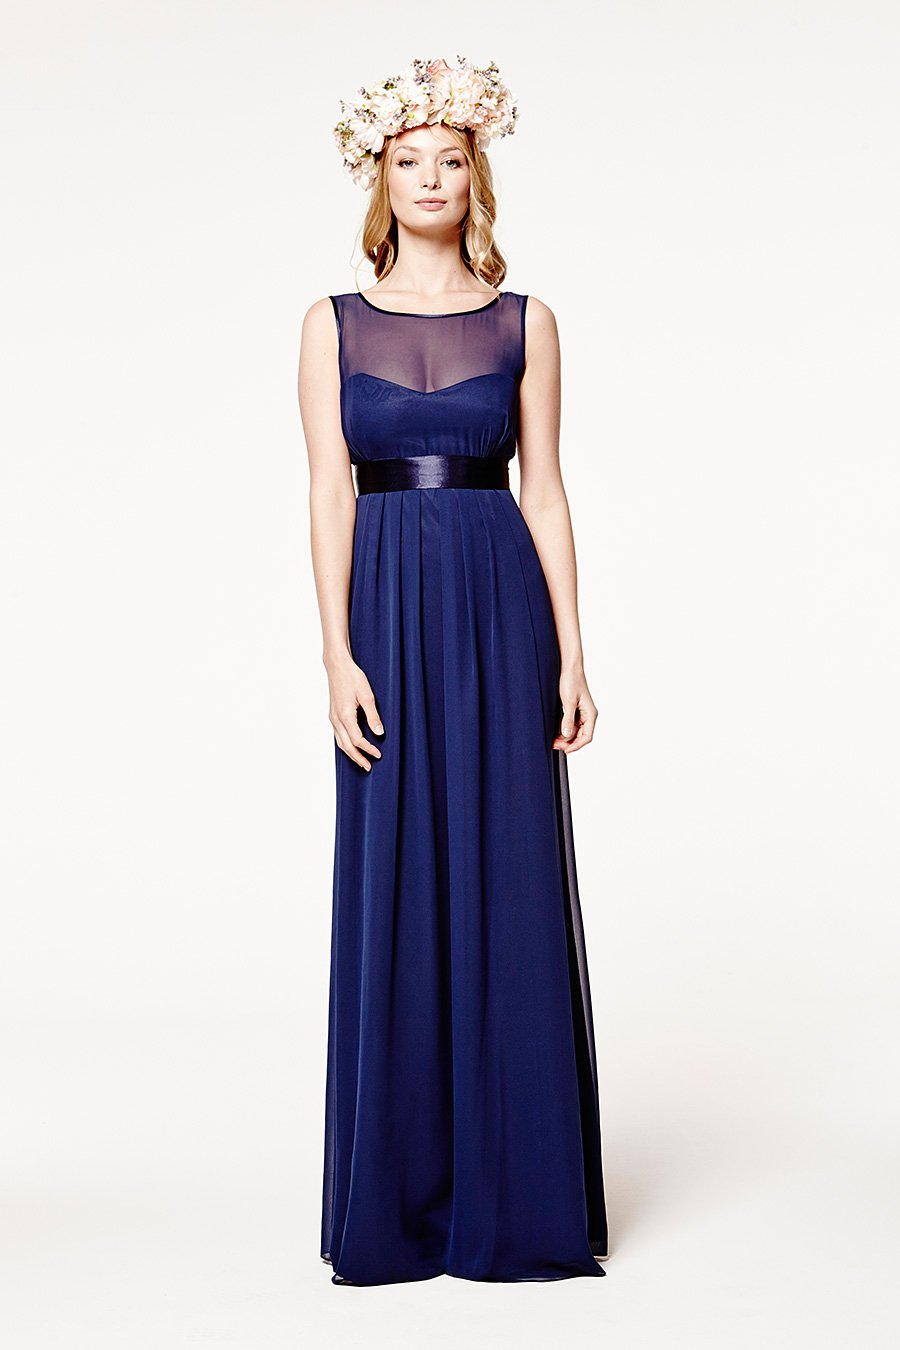 Charlotte Floaty Midnight Blue Dress